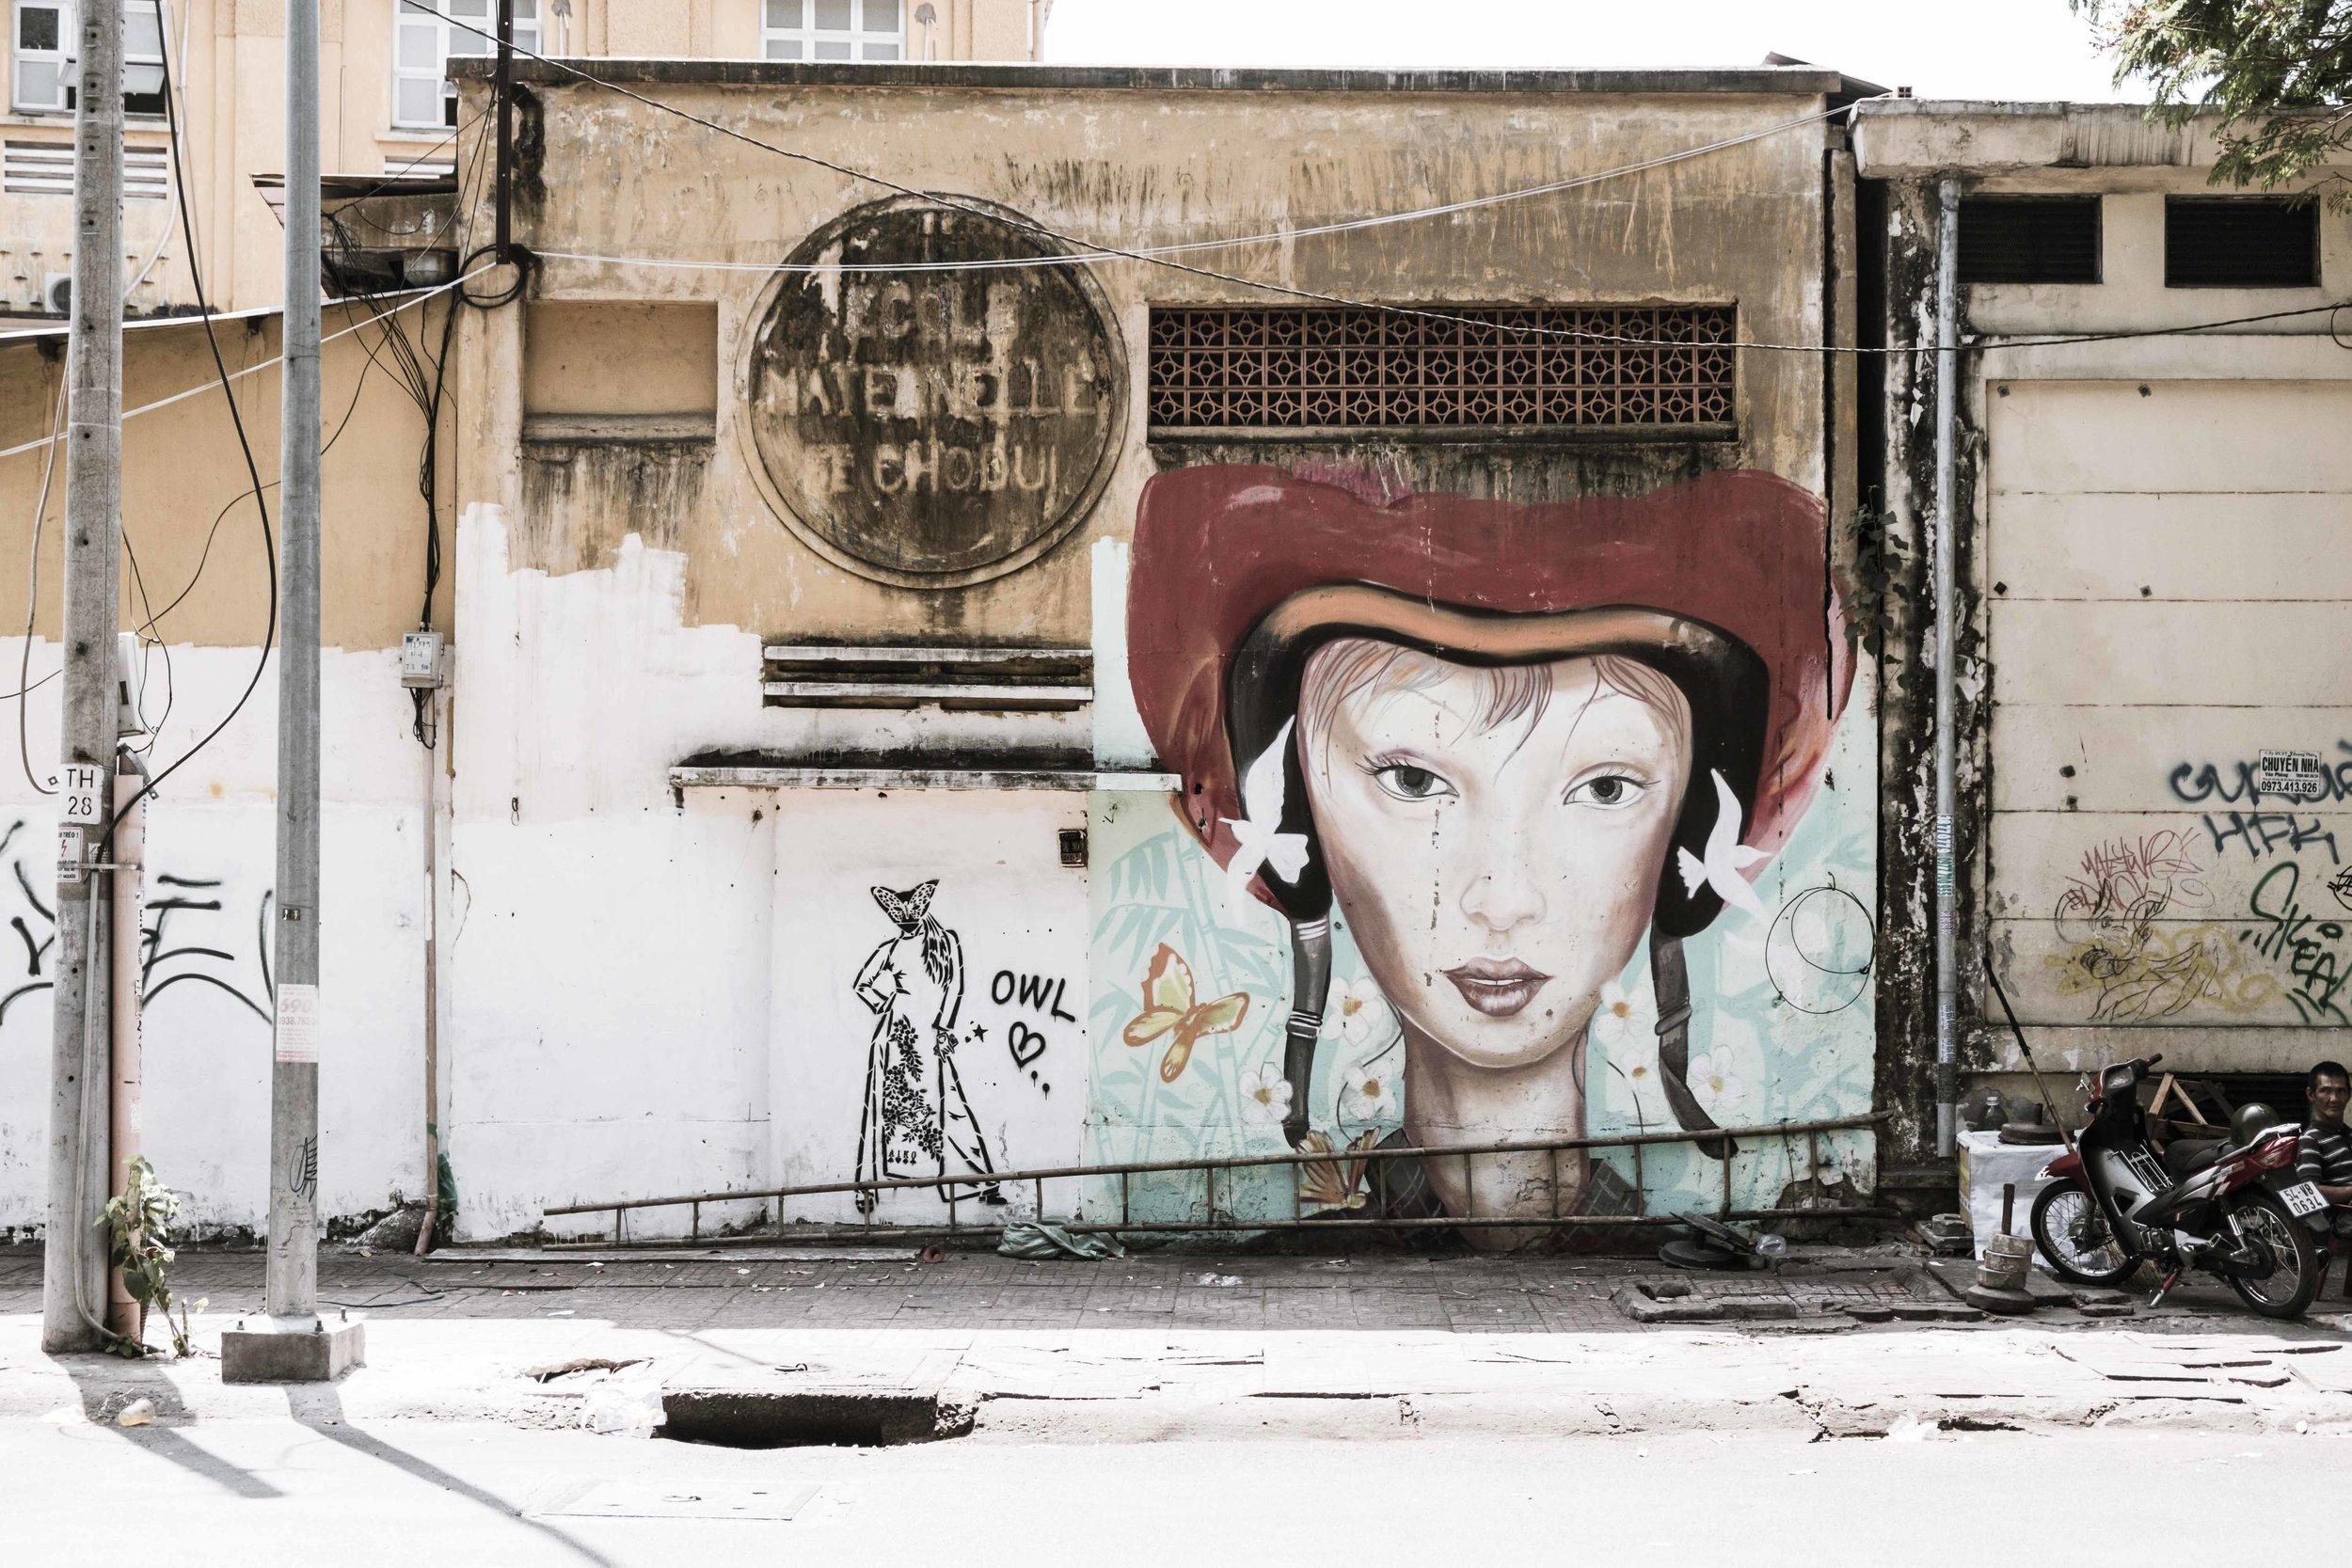 Street Art in Saigon